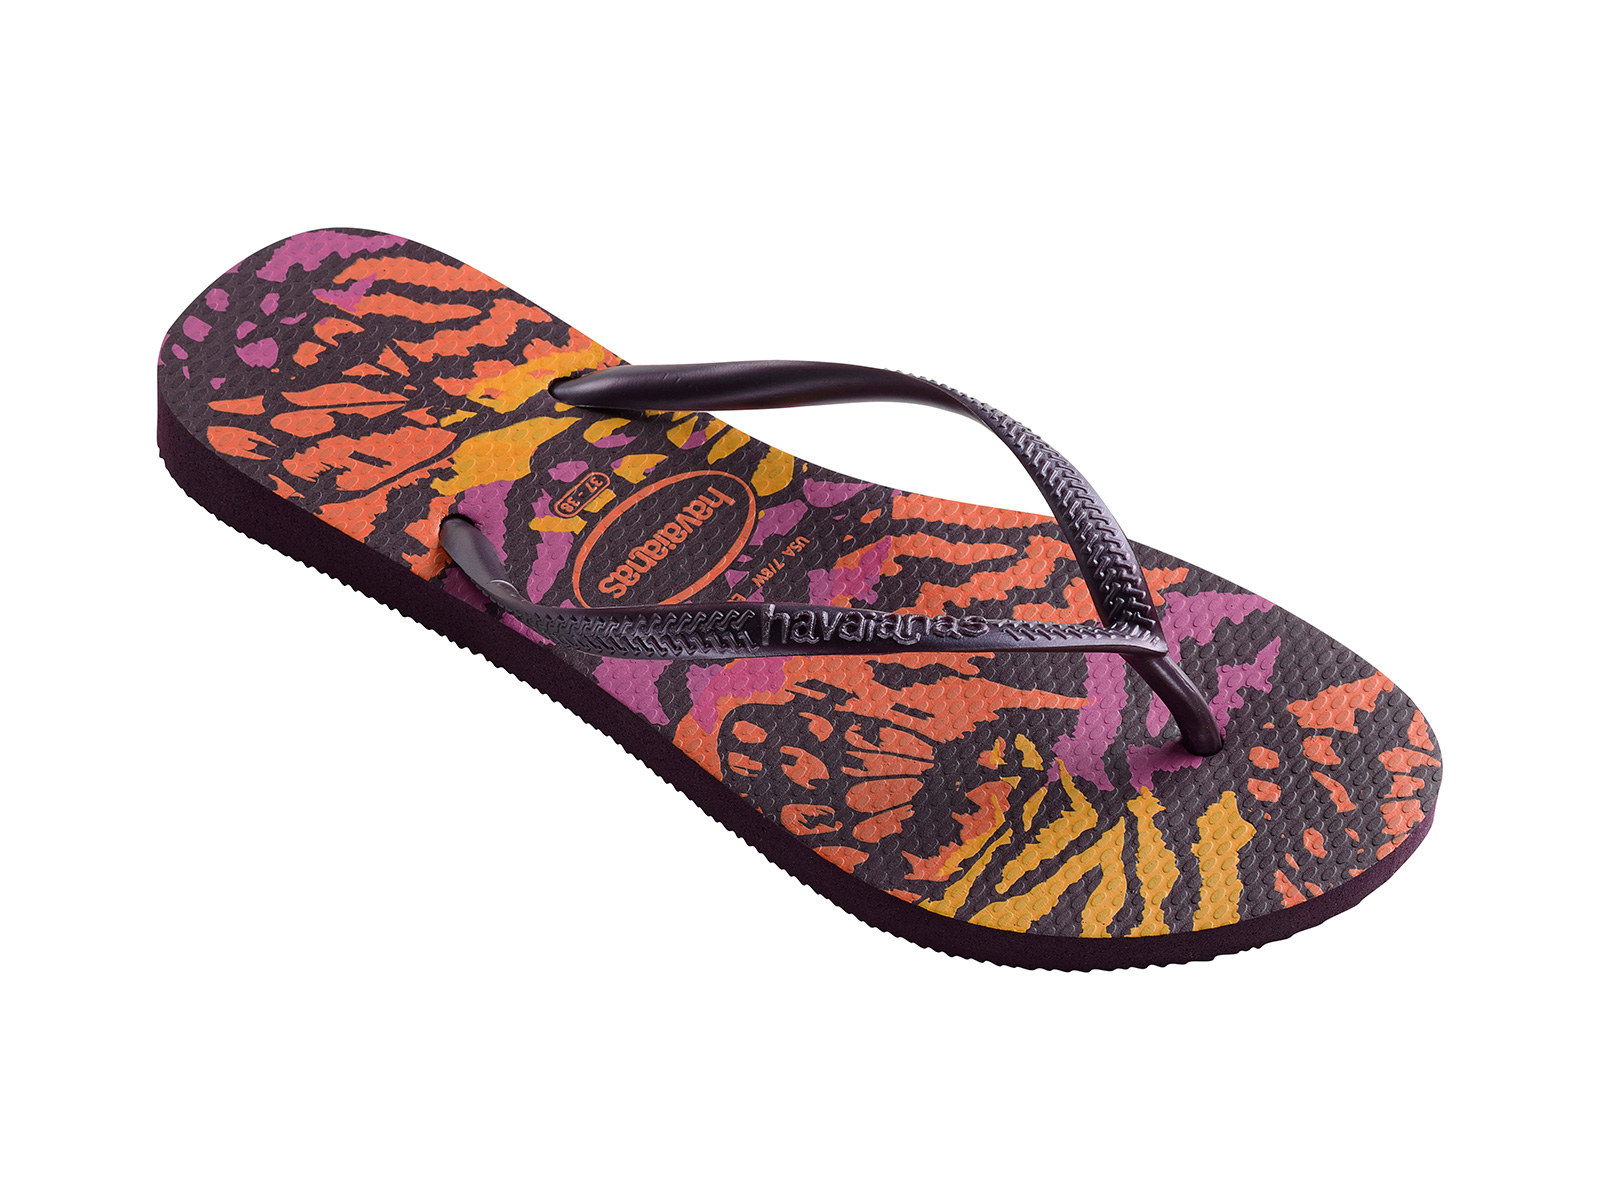 c373011513dff1 Flip-Flops Colorful Animal Print Flip Flops - Slim Animals Aubergine